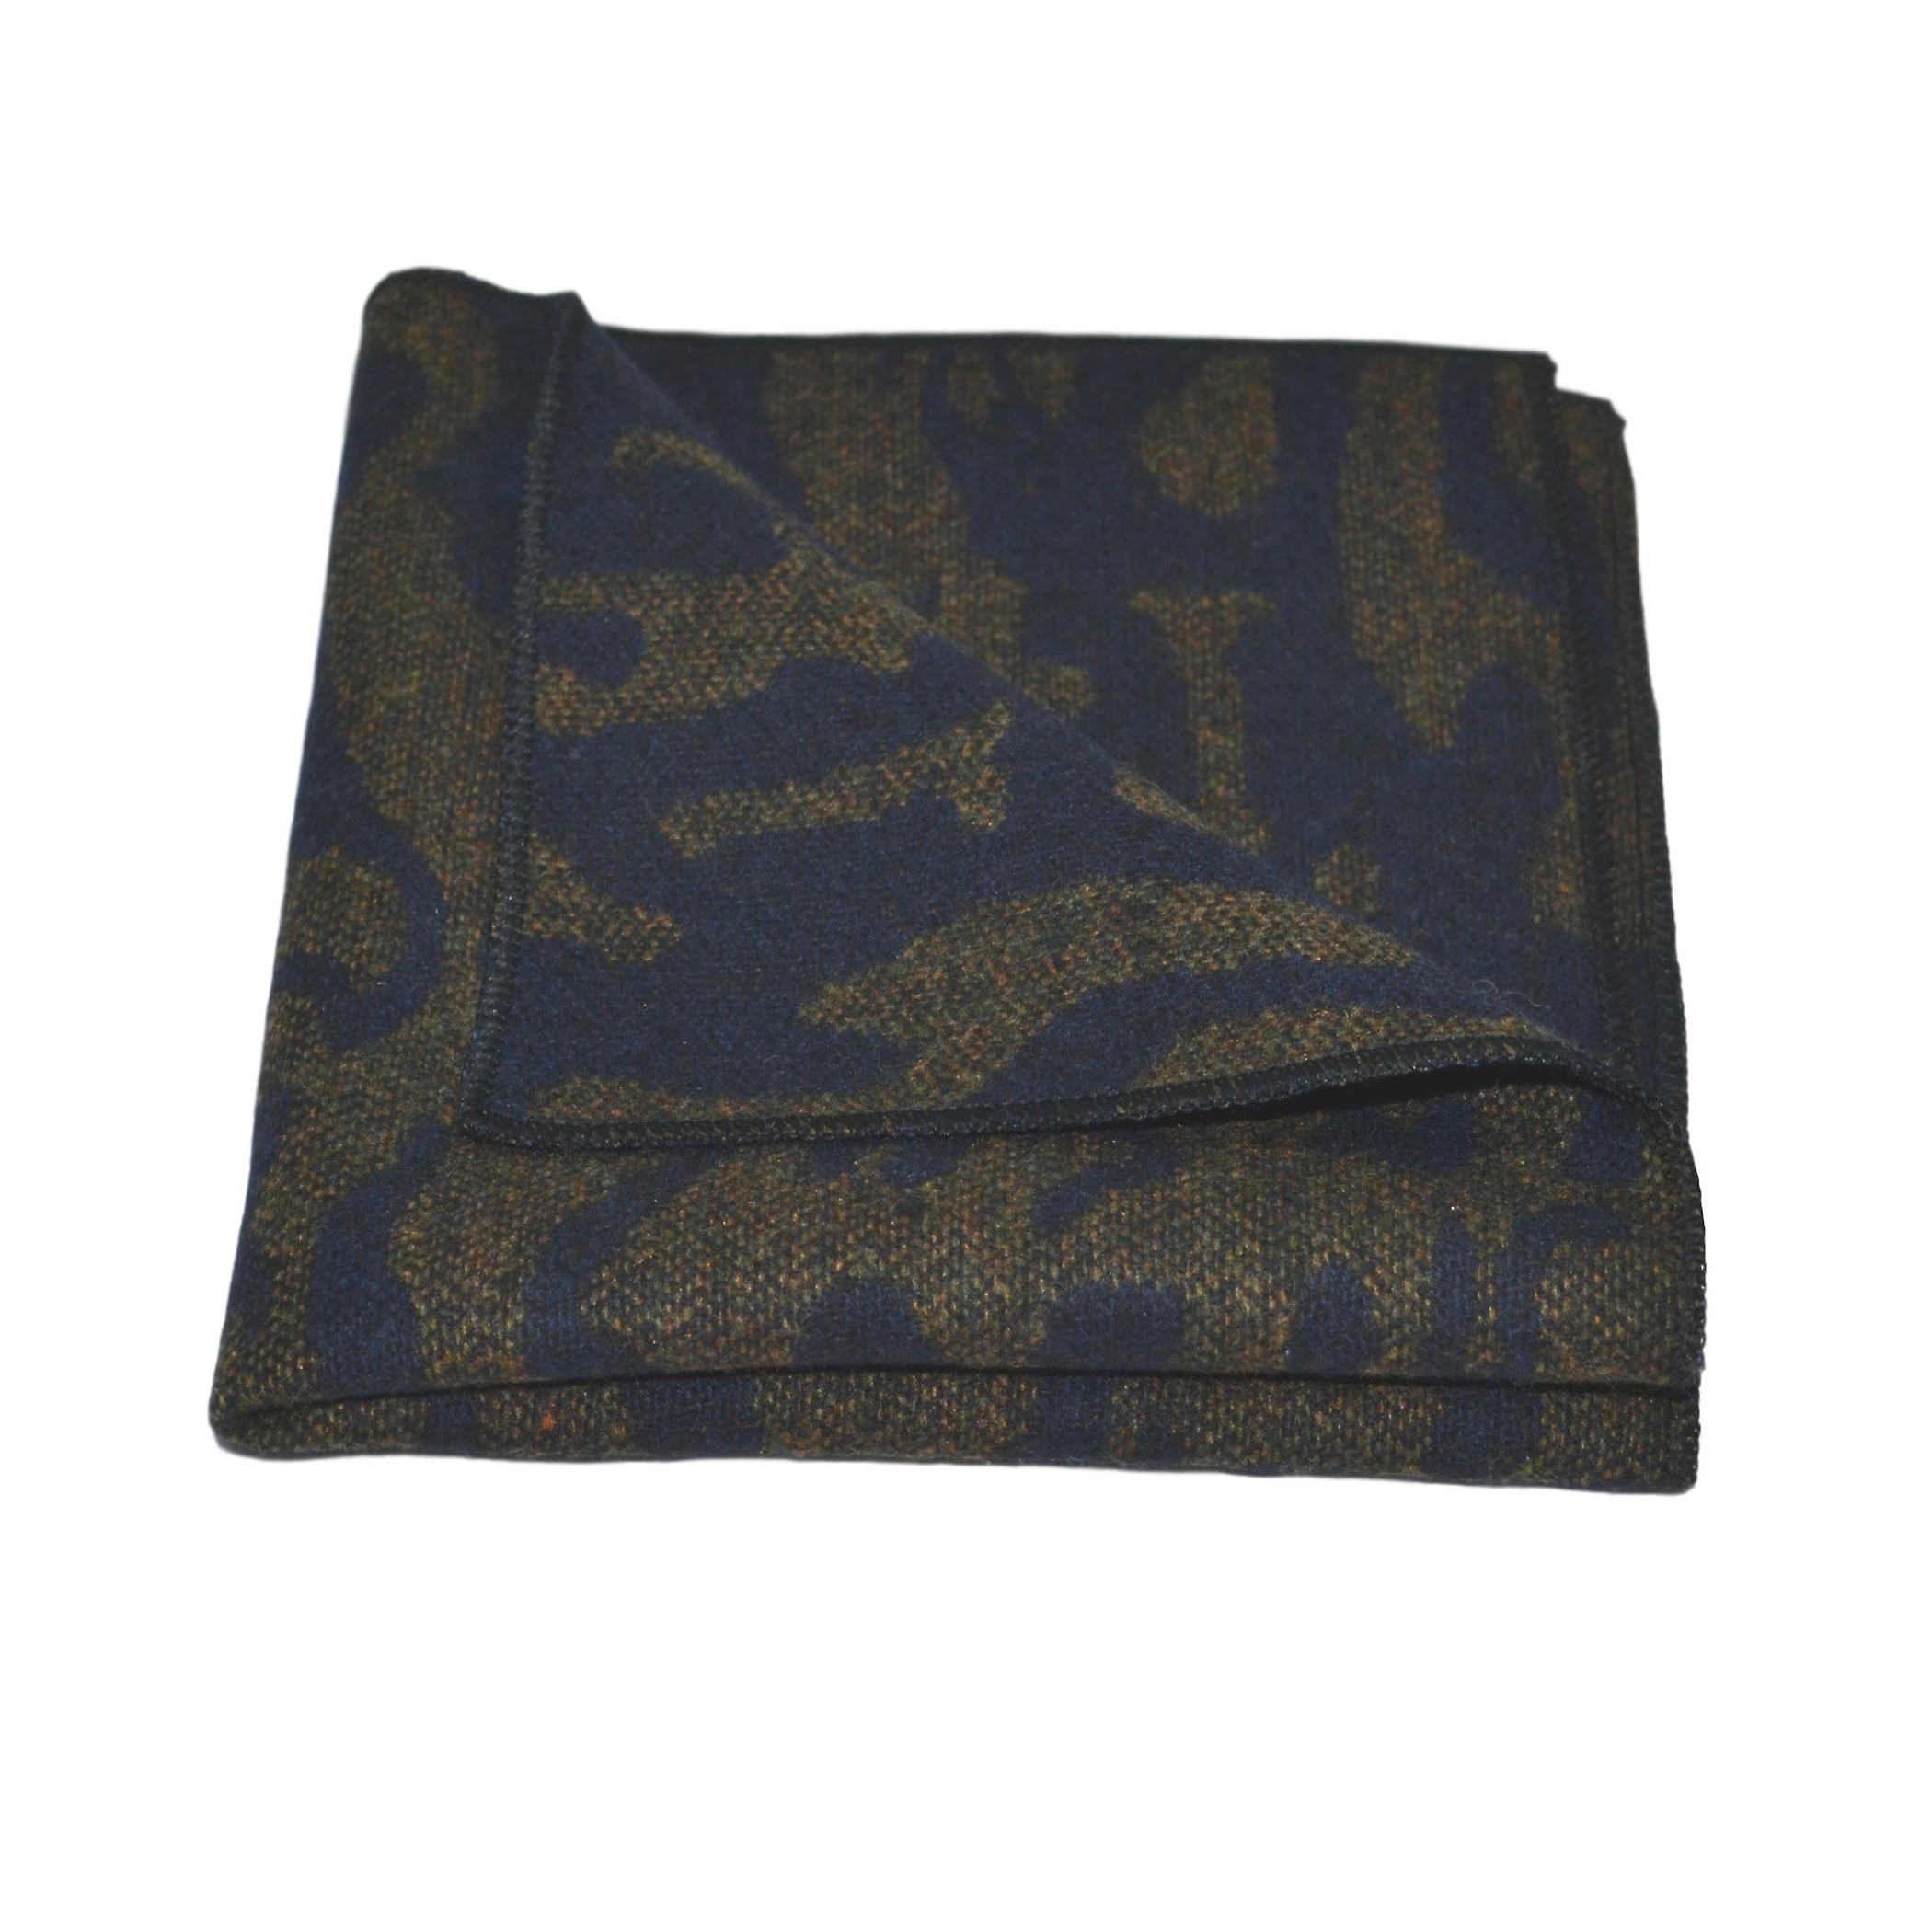 Luxury Arabic Navy Blue Pattern Bow Tie & Pocket Square Set